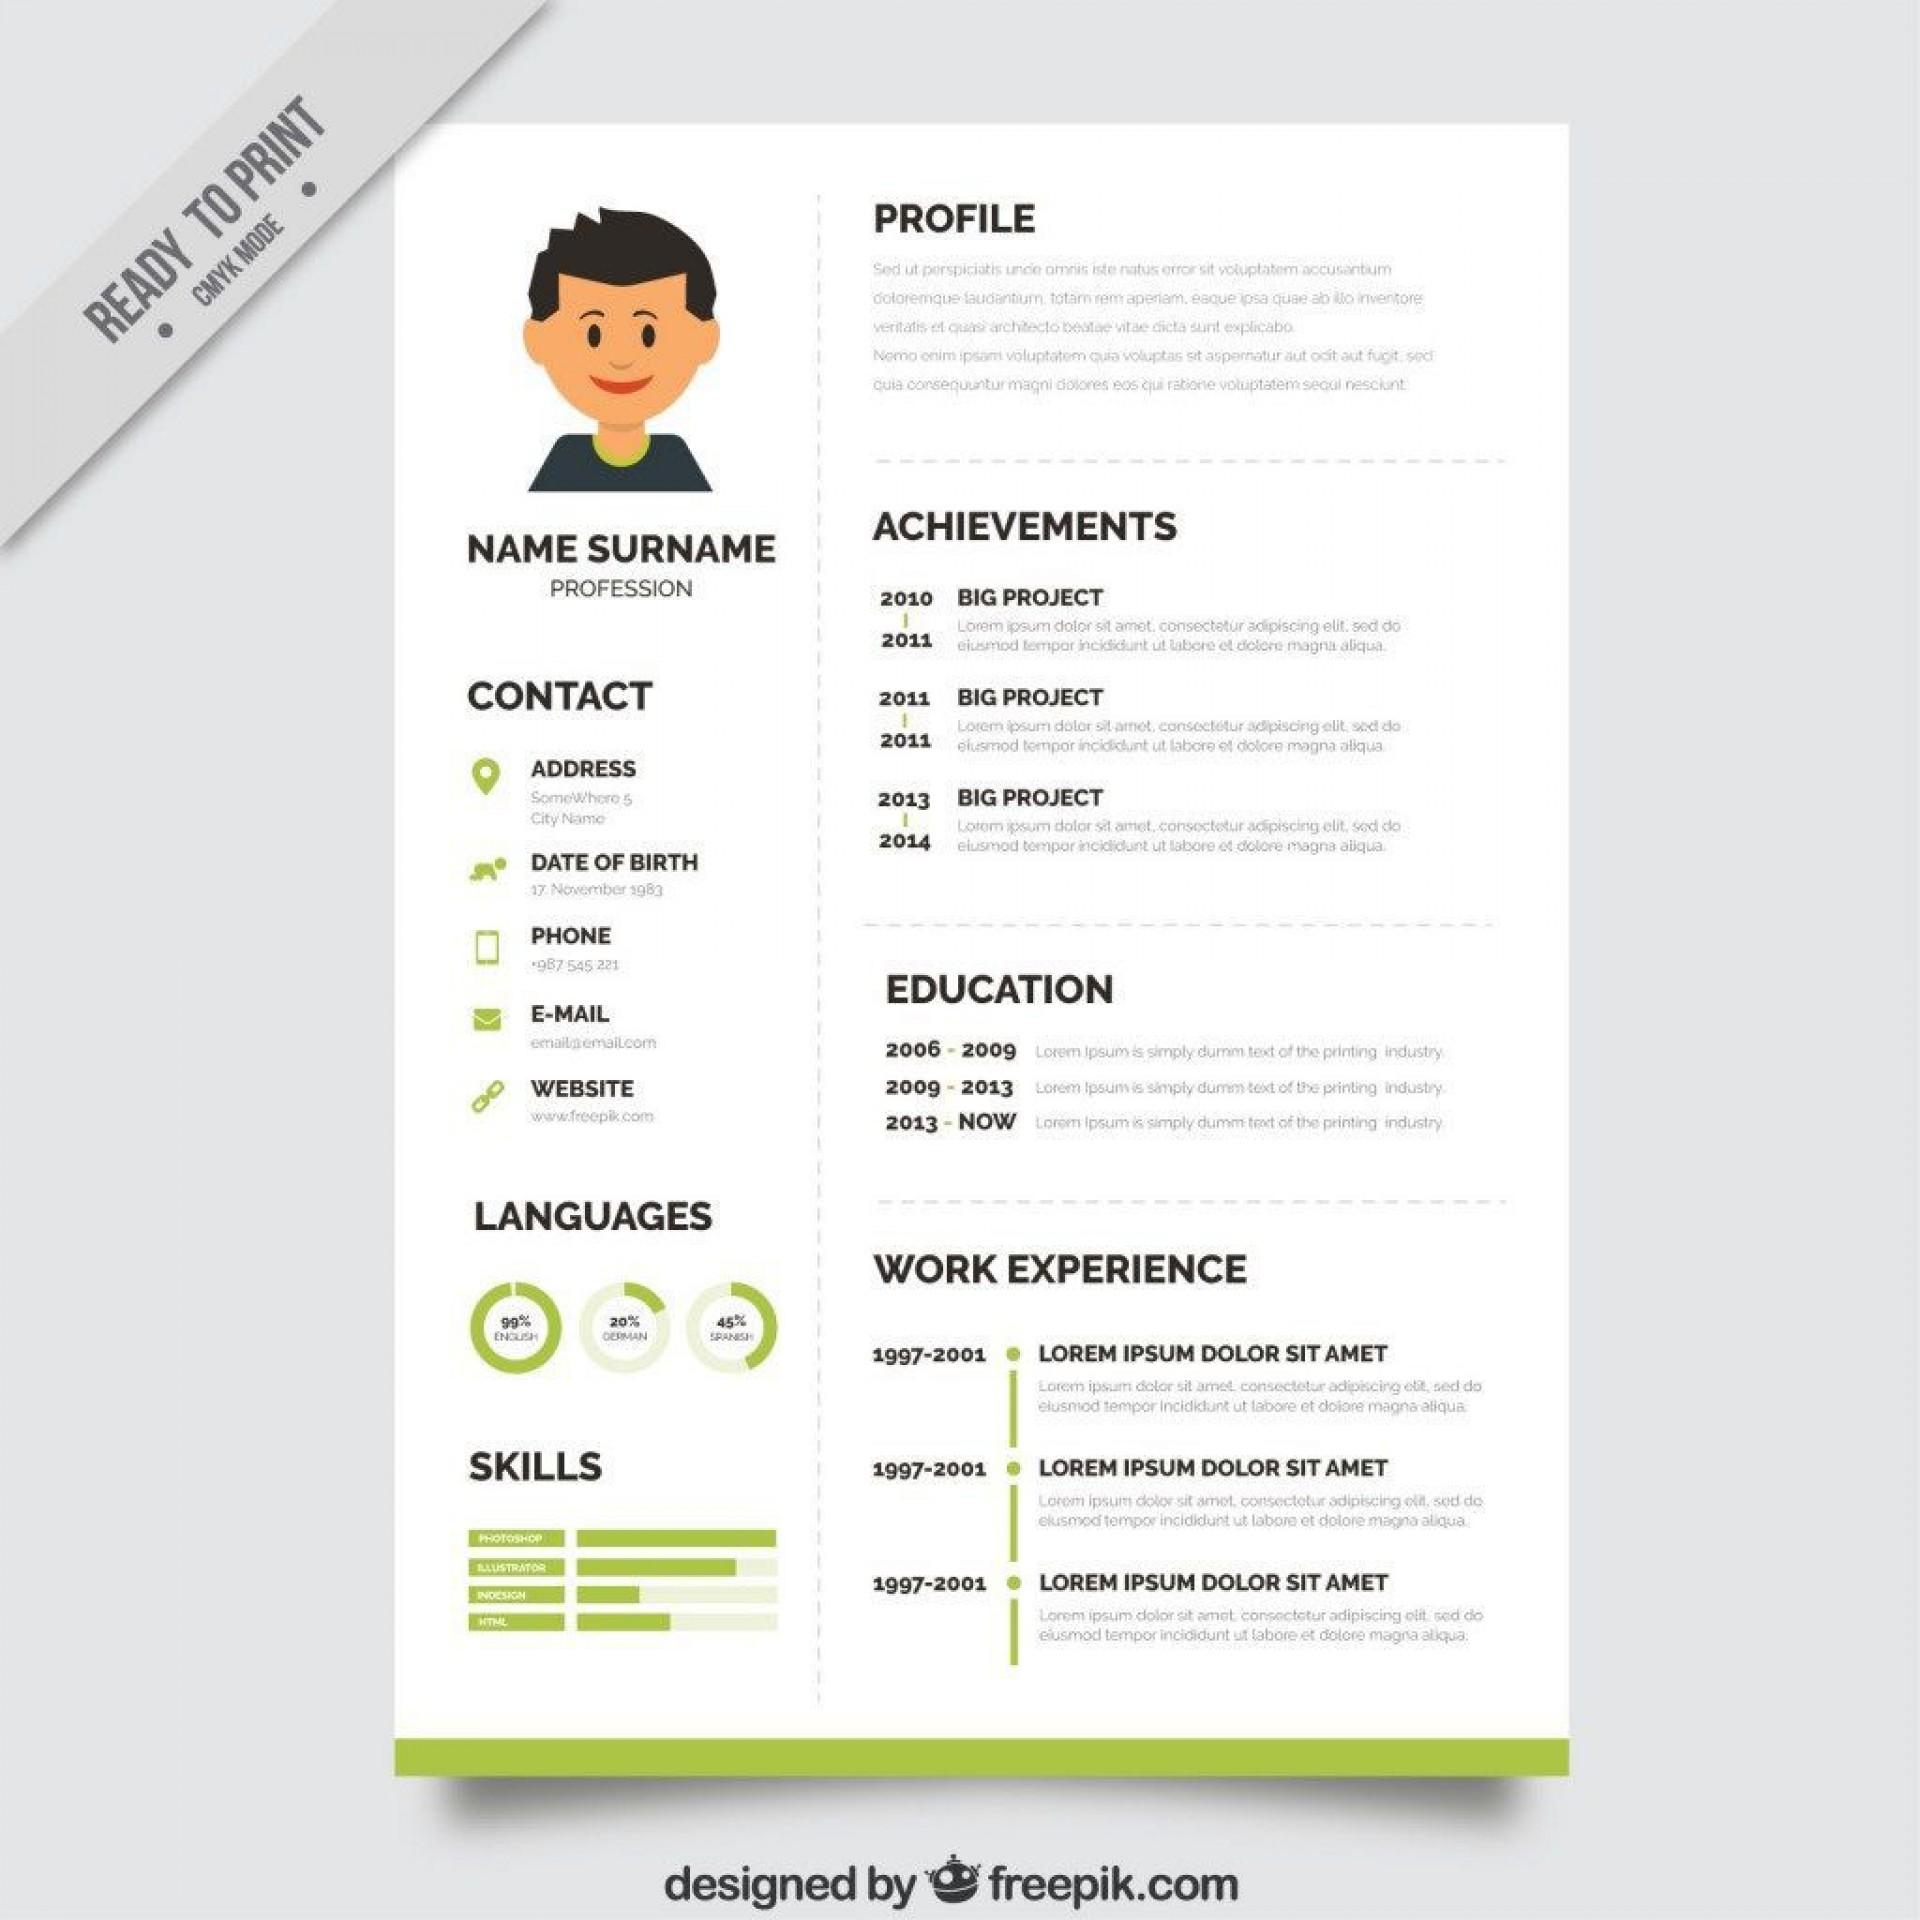 005 Stupendou Sample Curriculum Vitae Template Download Design  Professional Pdf Free For Student1920